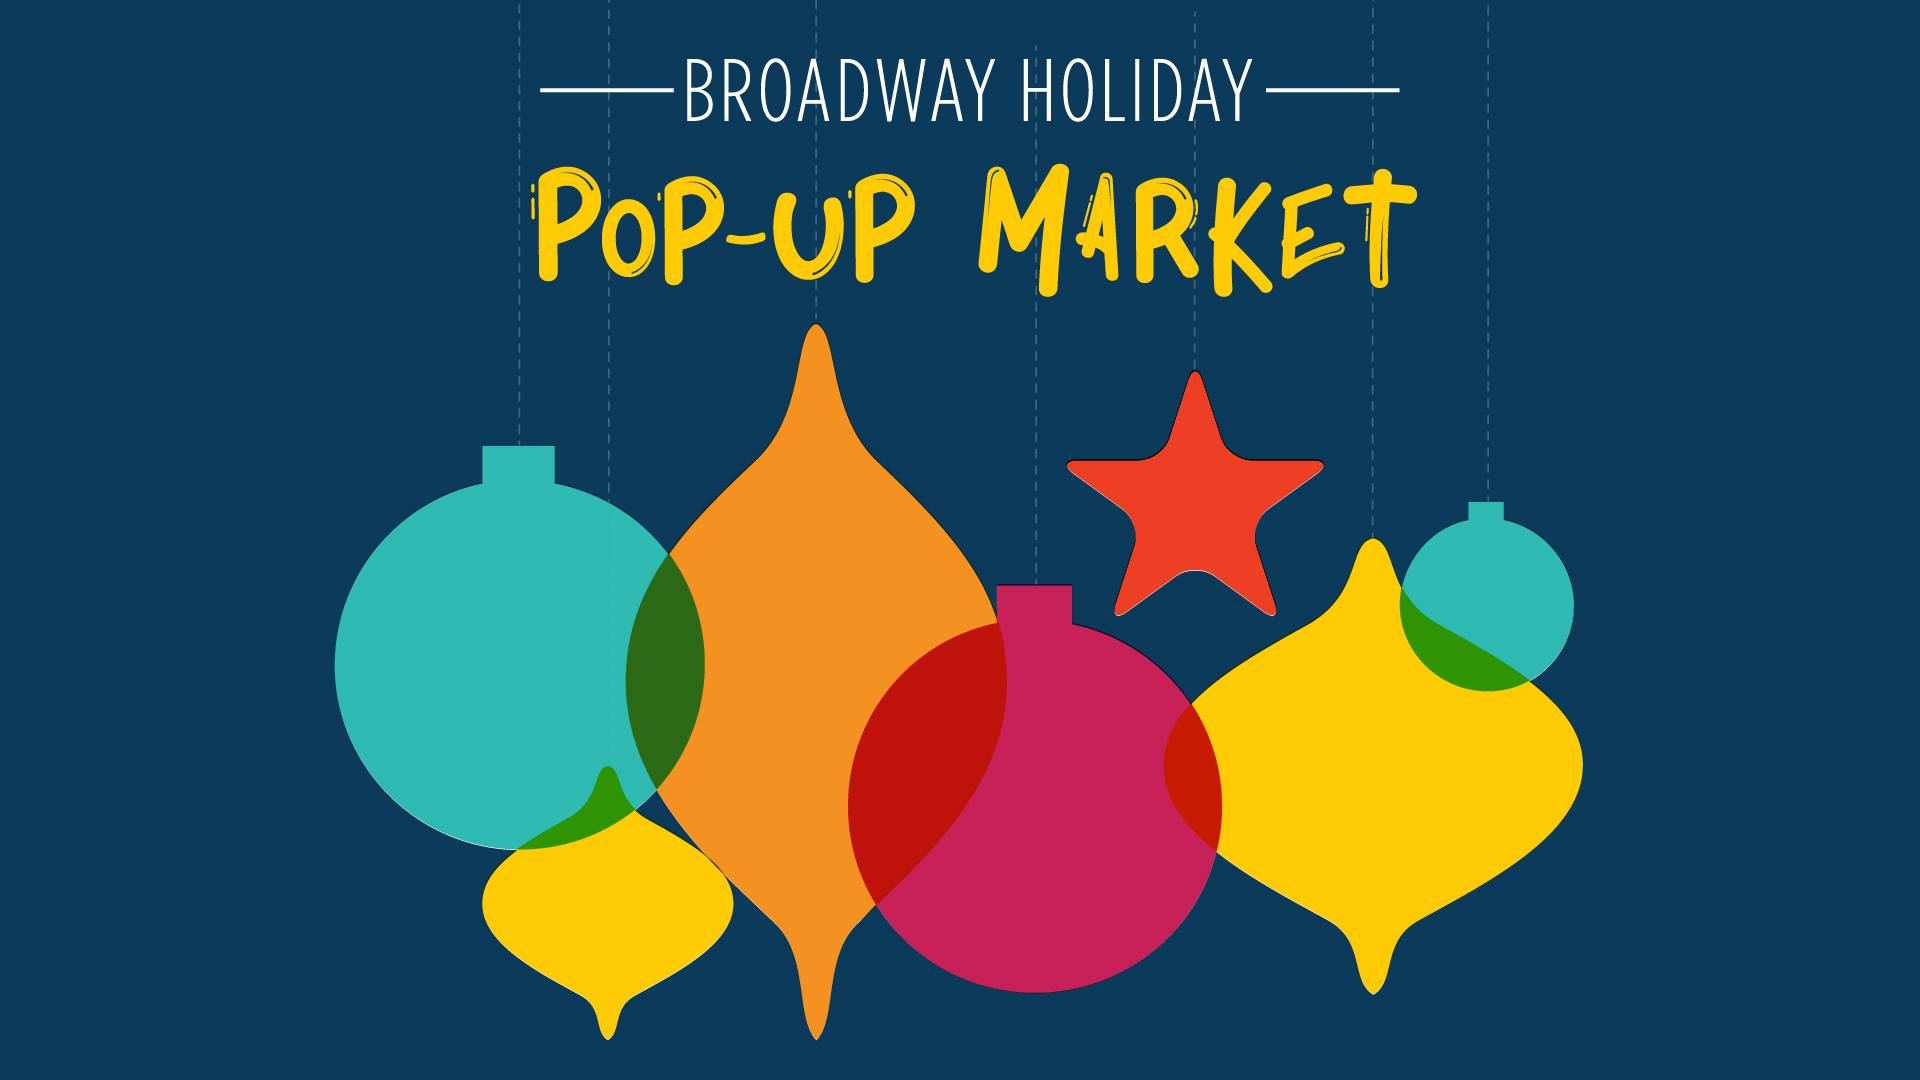 Broadway Holiday Pop-Up Market